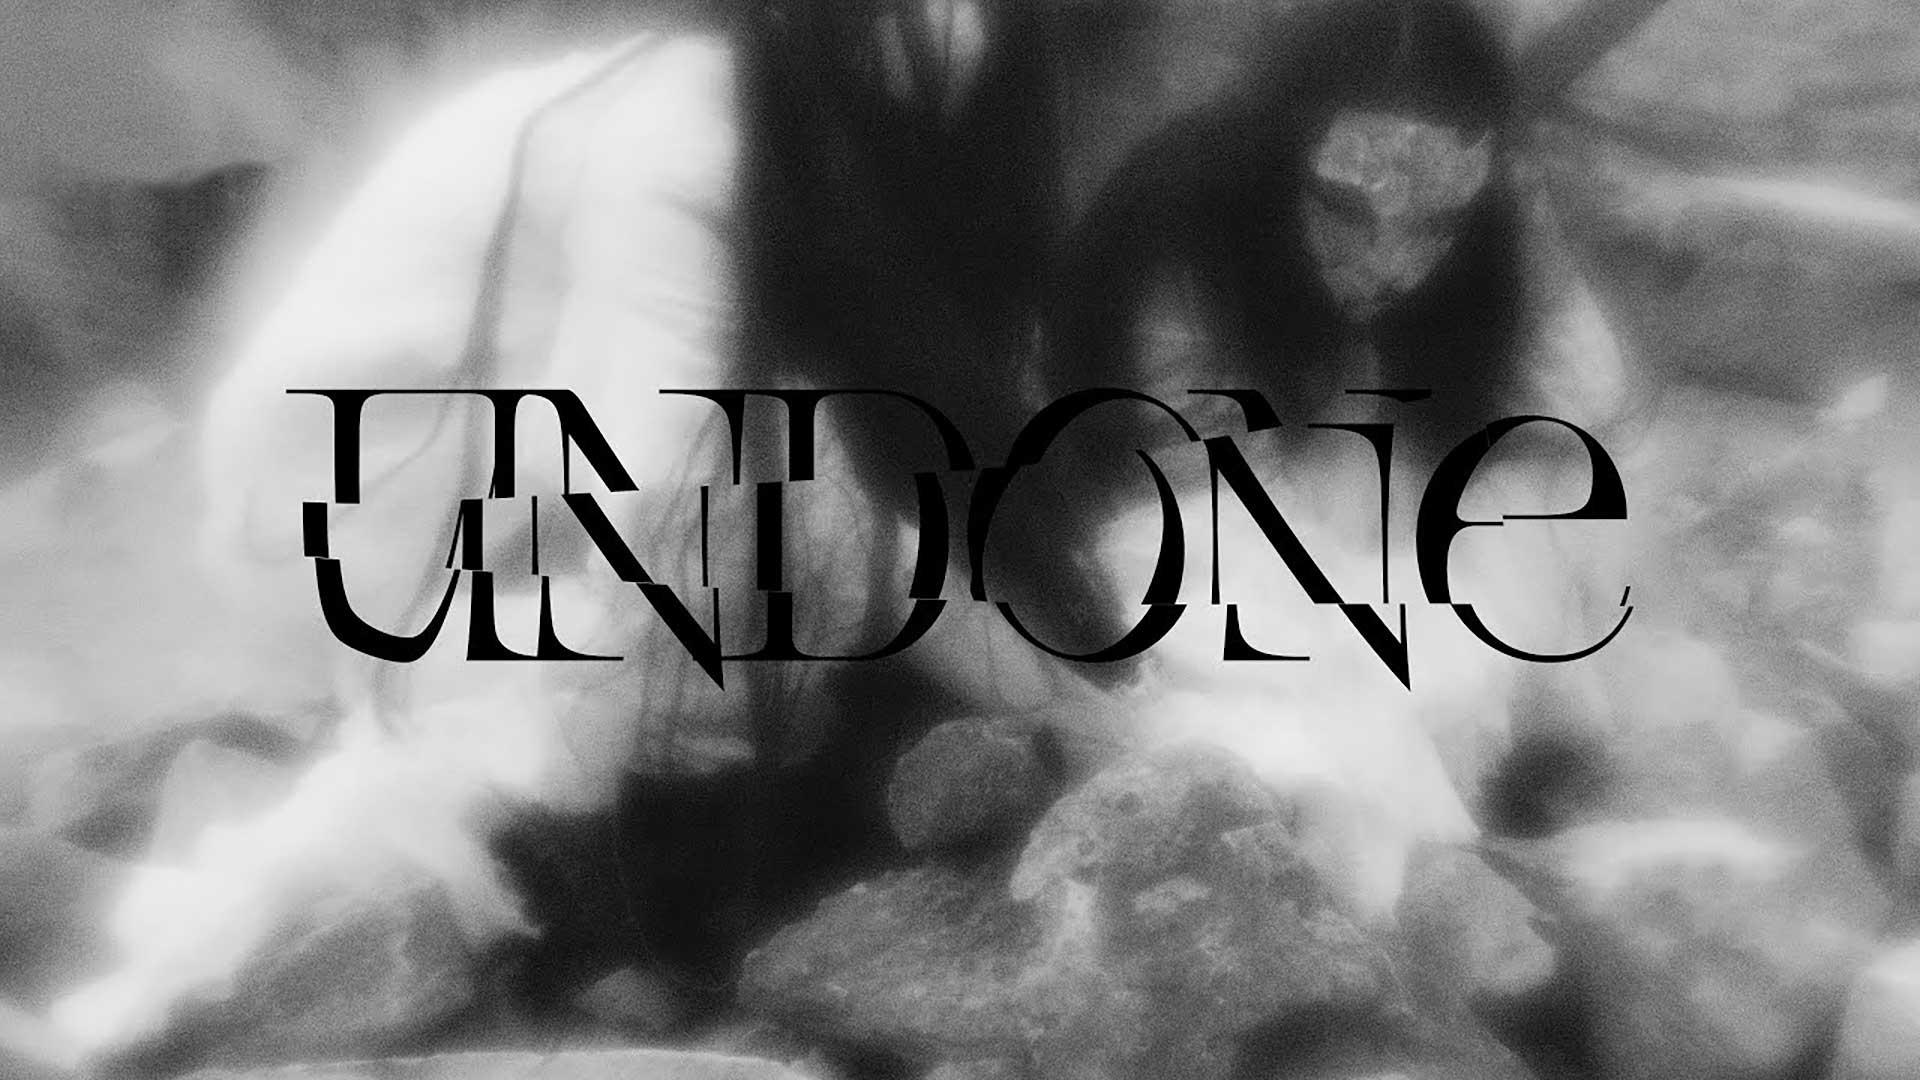 Kontravoid - Undone